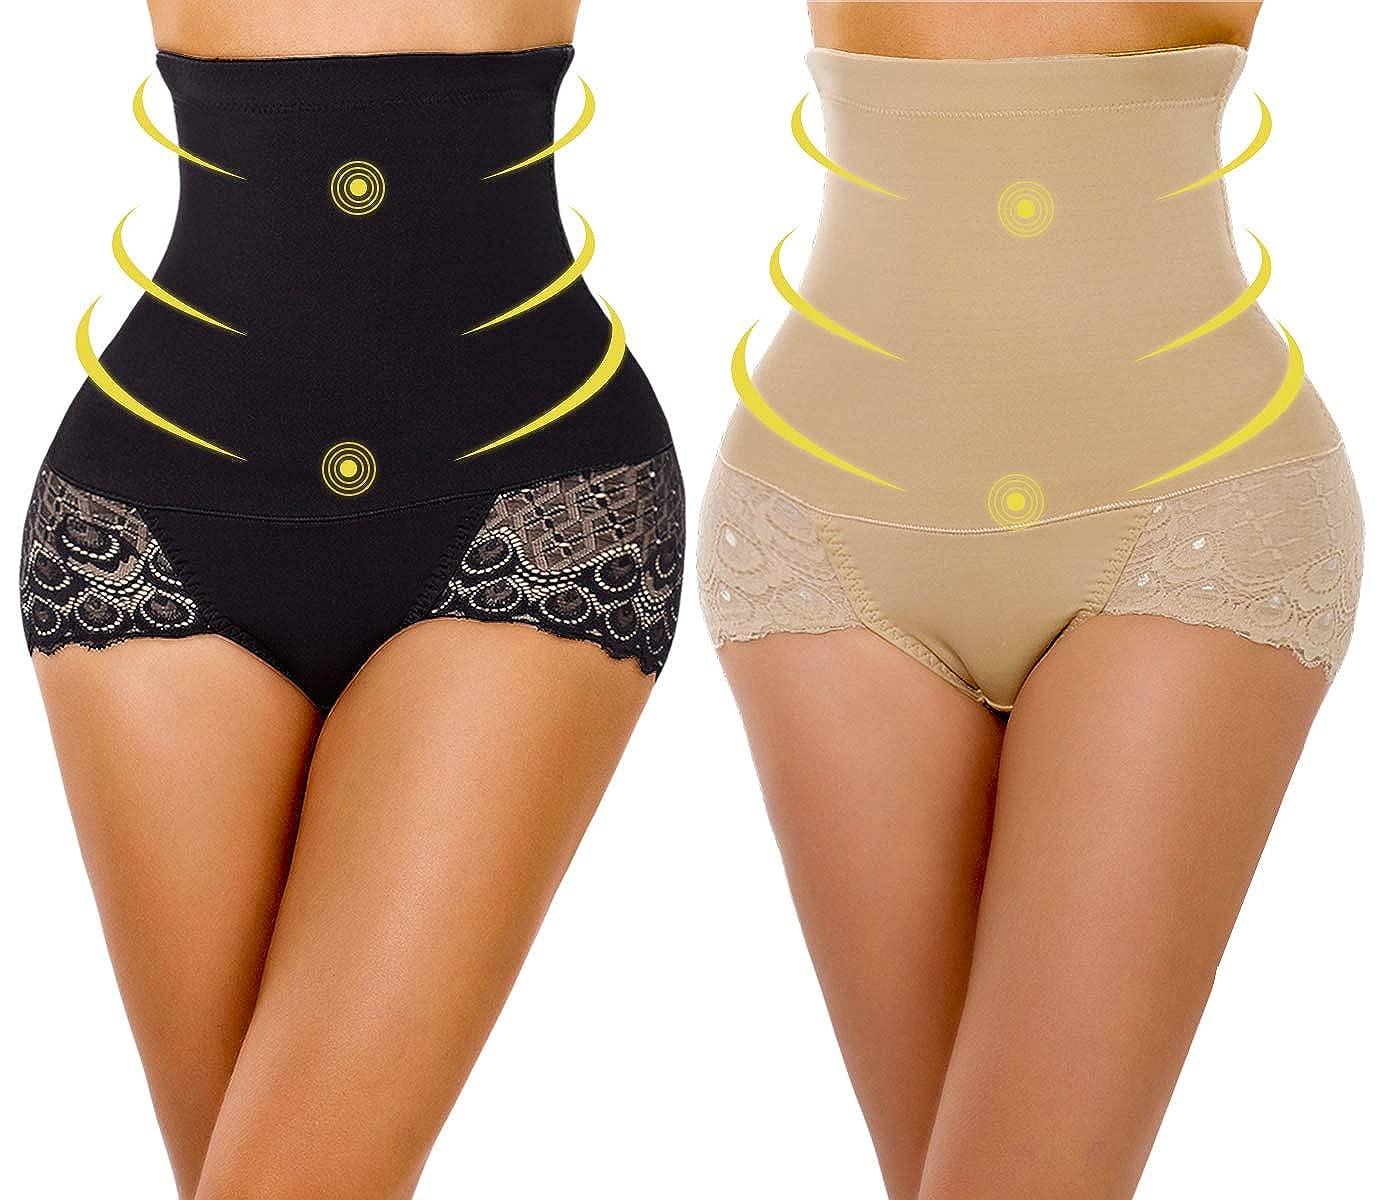 YaShaer 2 Pack Body Shaper High Waist Tummy Control Butt Lifter Slim ca501015-01-parent